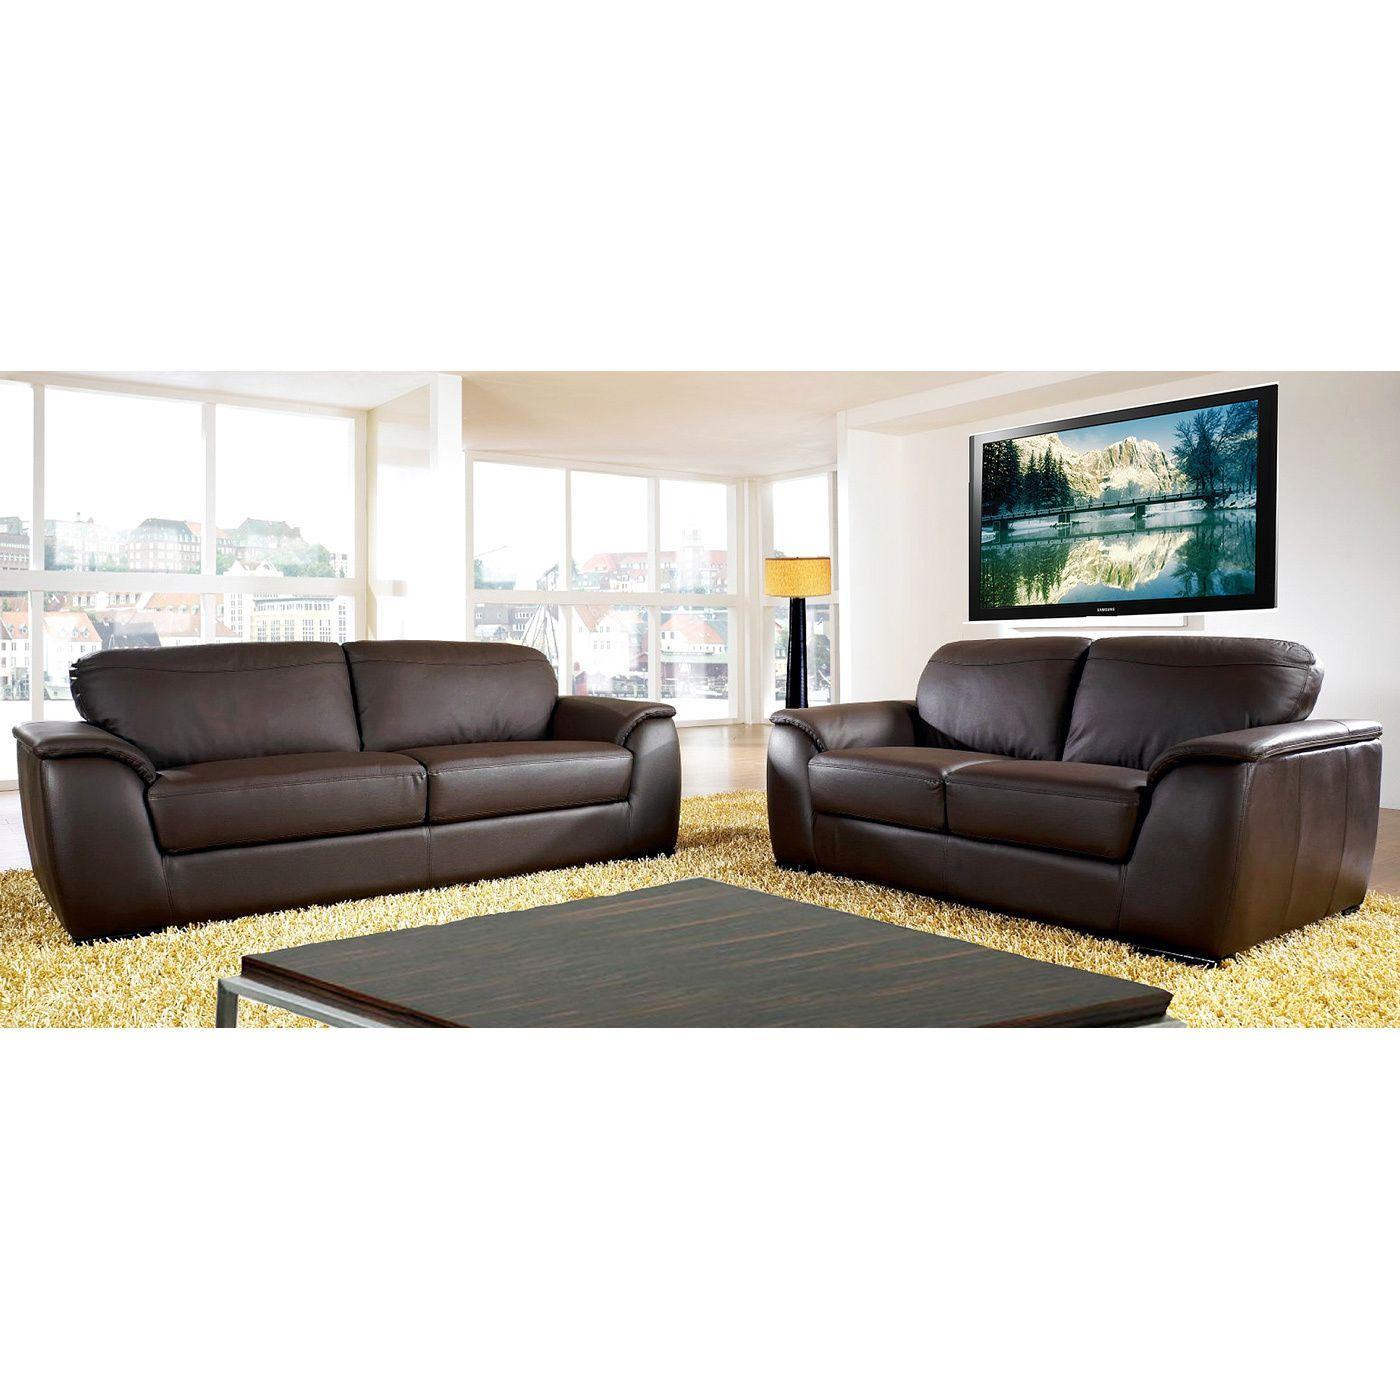 Abbyson Ashton Top Grain Leather Sofa And Loveseat Set Living Brown